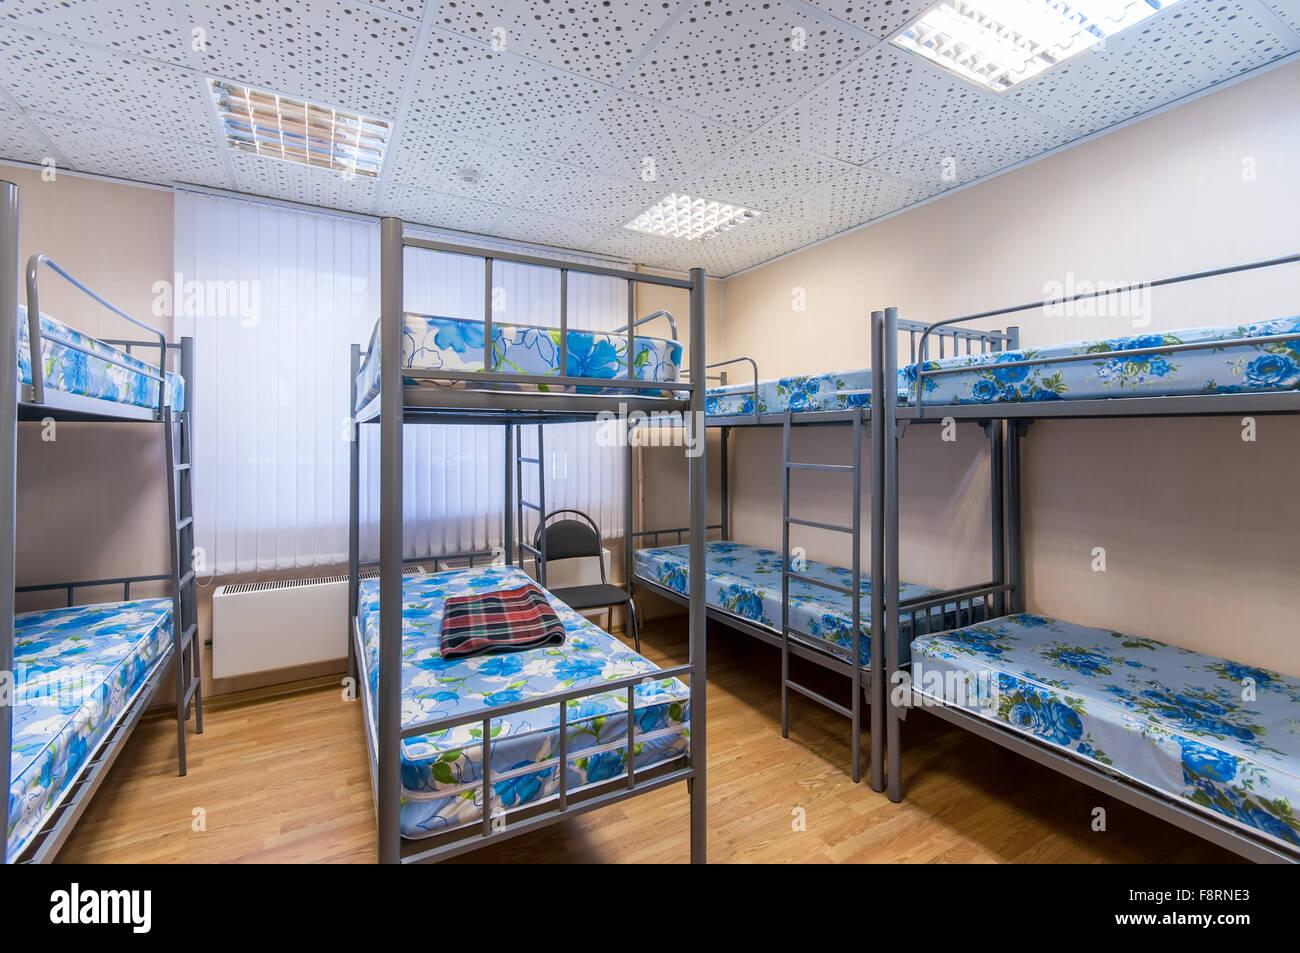 Etagenbett Metall : Metall etagenbett in saubere herberge zimmer stockfoto bild